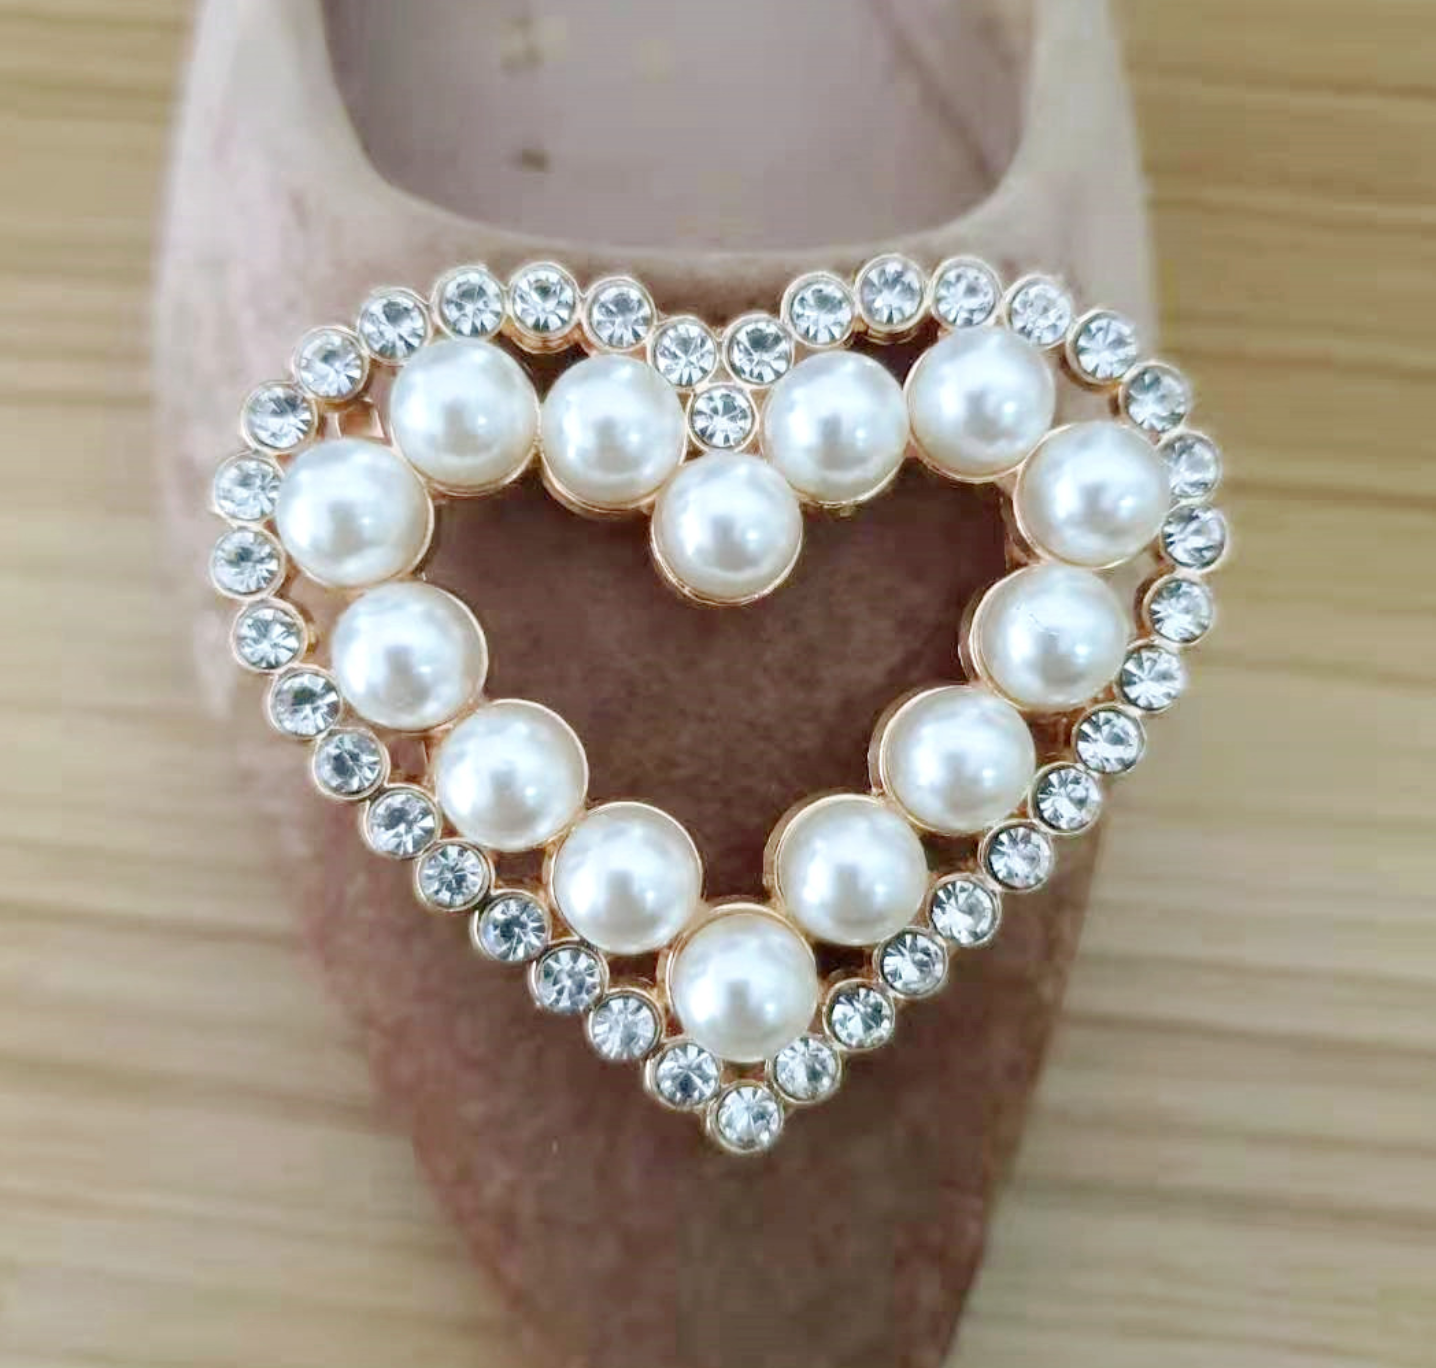 2 Pcs Rhinestone Crystal Heart Diamante Crystal Wedding Shoes Shoe Clips Charms